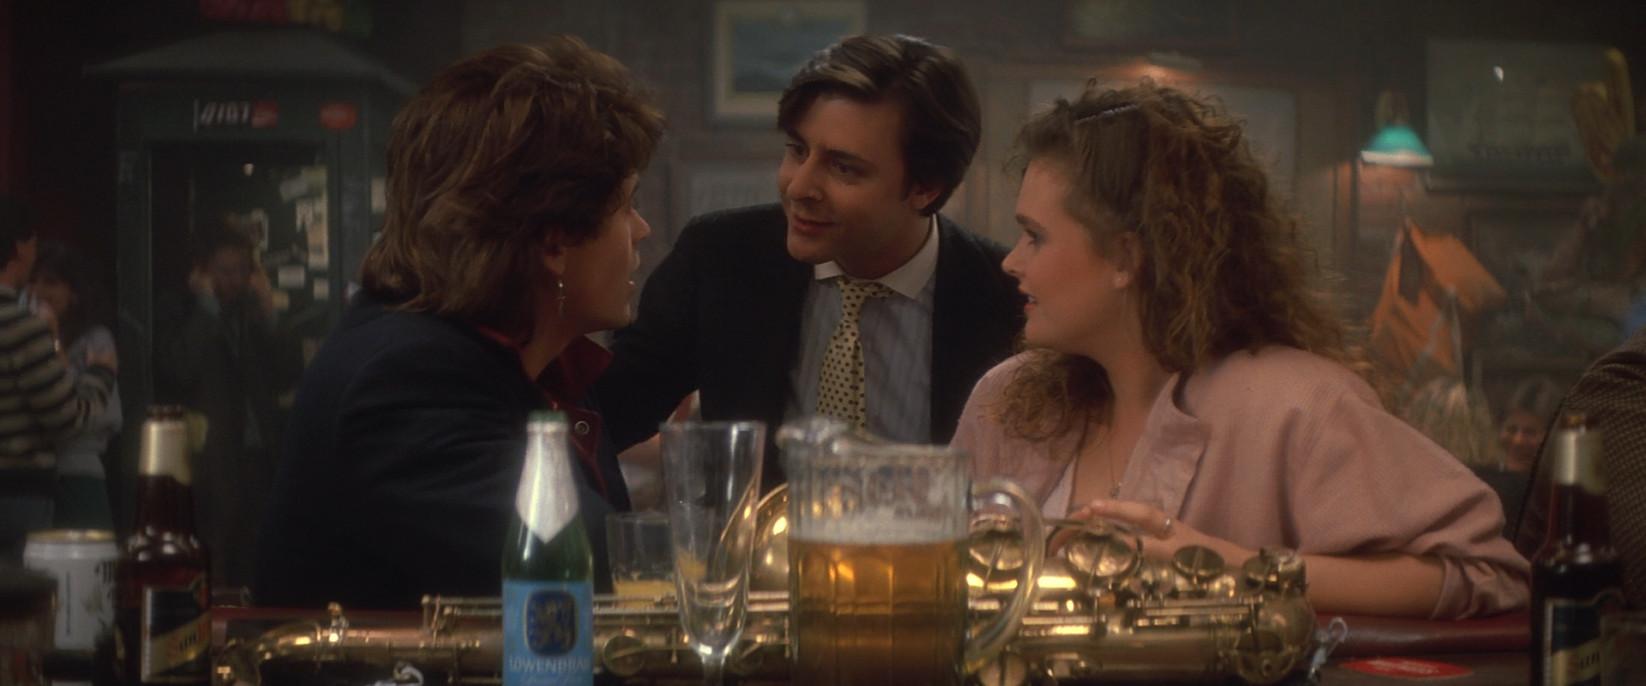 e60Rln - St. Elmo, punto de encuentro   1985   Drama. Amistad. Adolescencia   BDrip 1080p   eng.cast DTS 5.1   12,3 GB